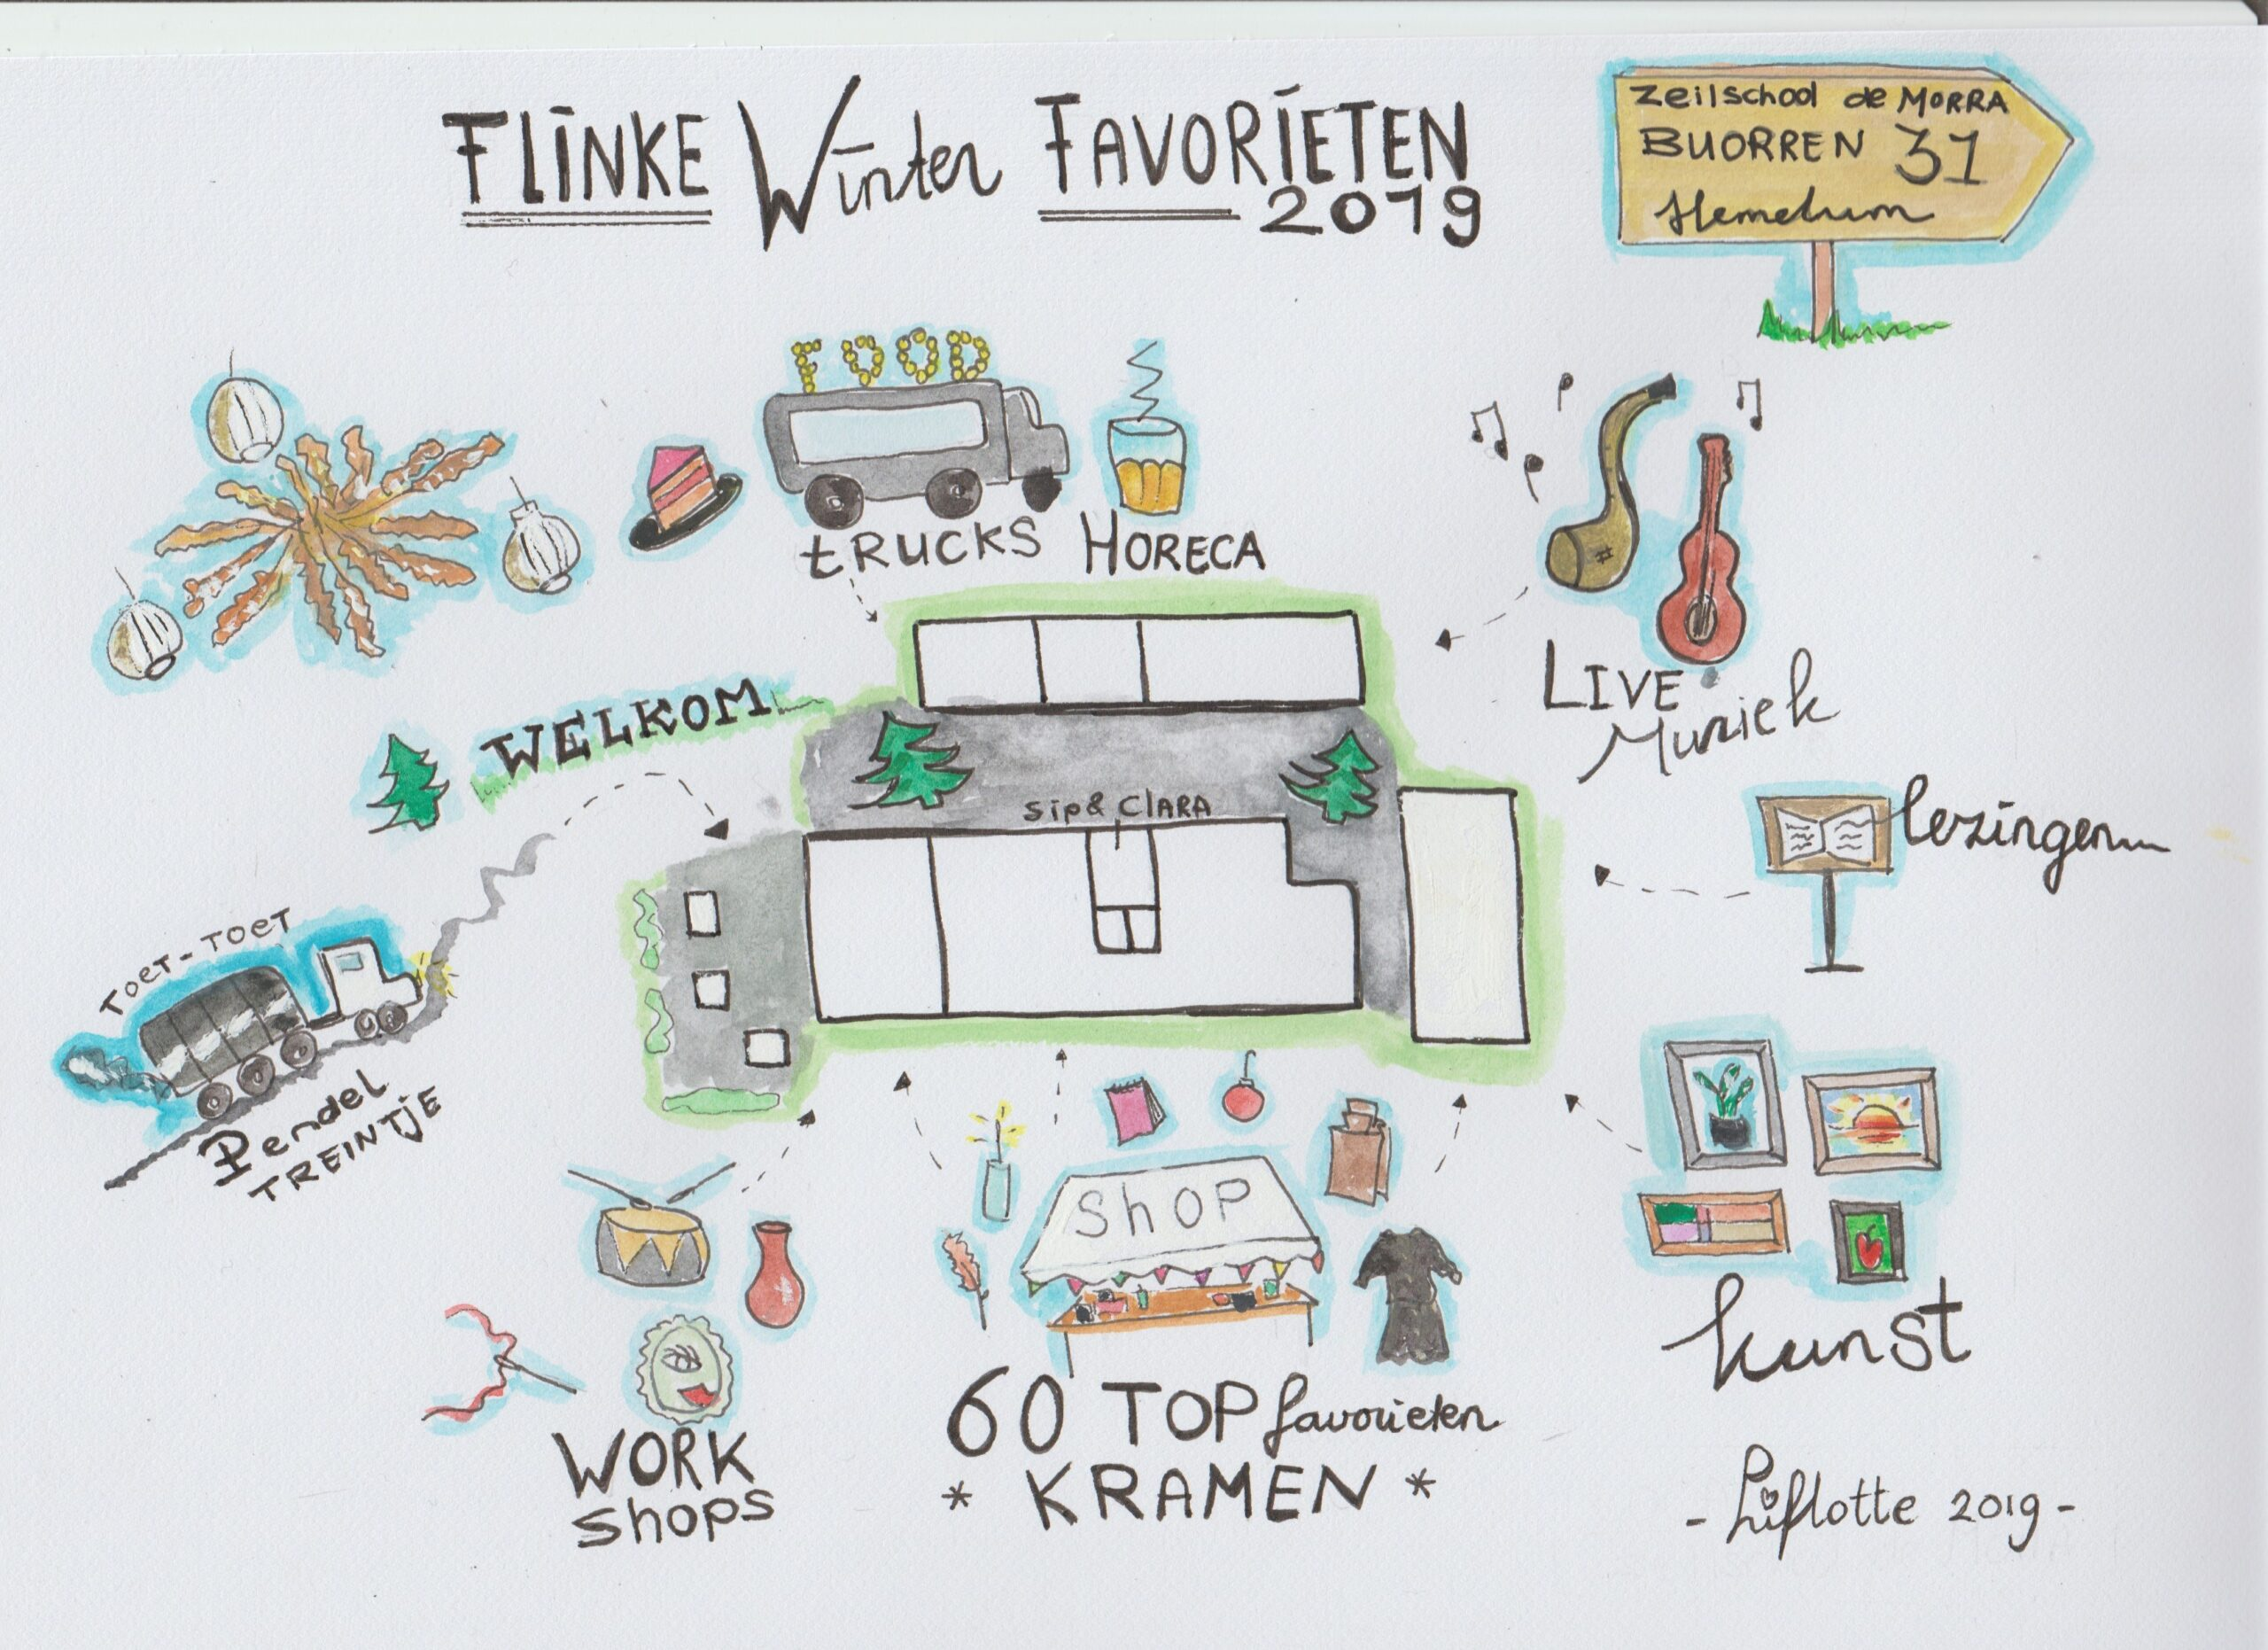 Liflotte Plattegrond Flinke Winter Favorieten 2019